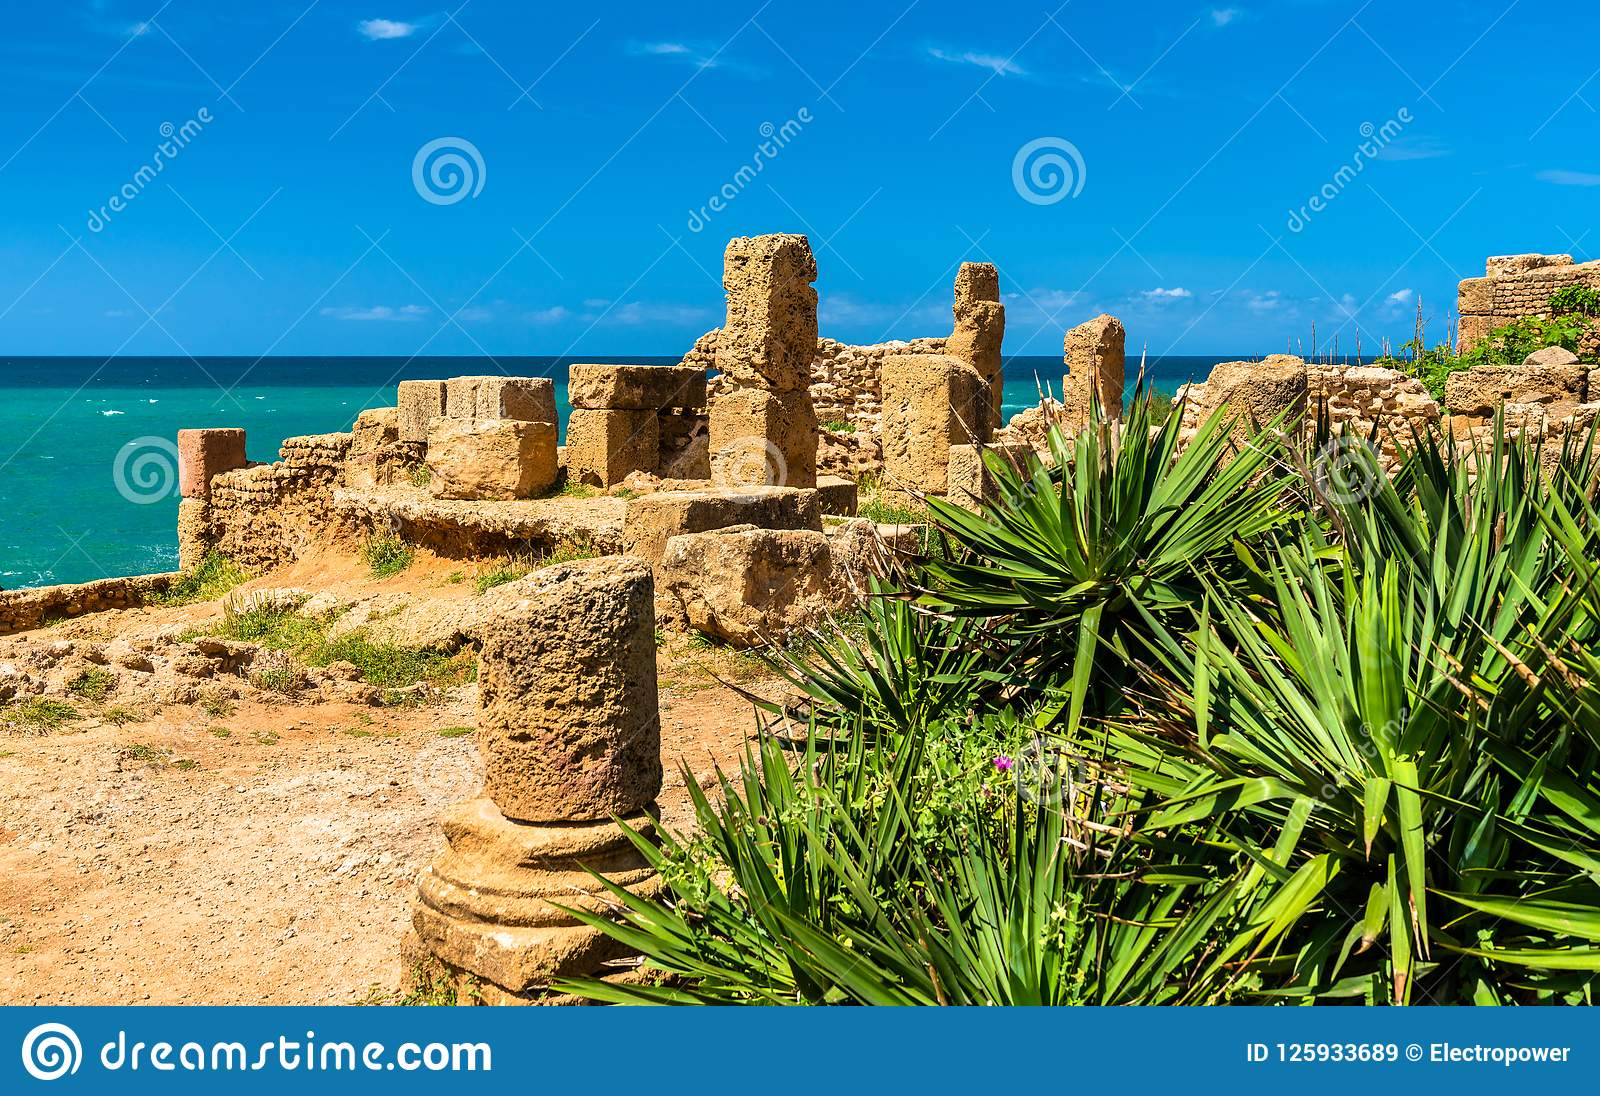 Ruiny Tipasa, Romański colonia w Algieria, afryka pólnocna